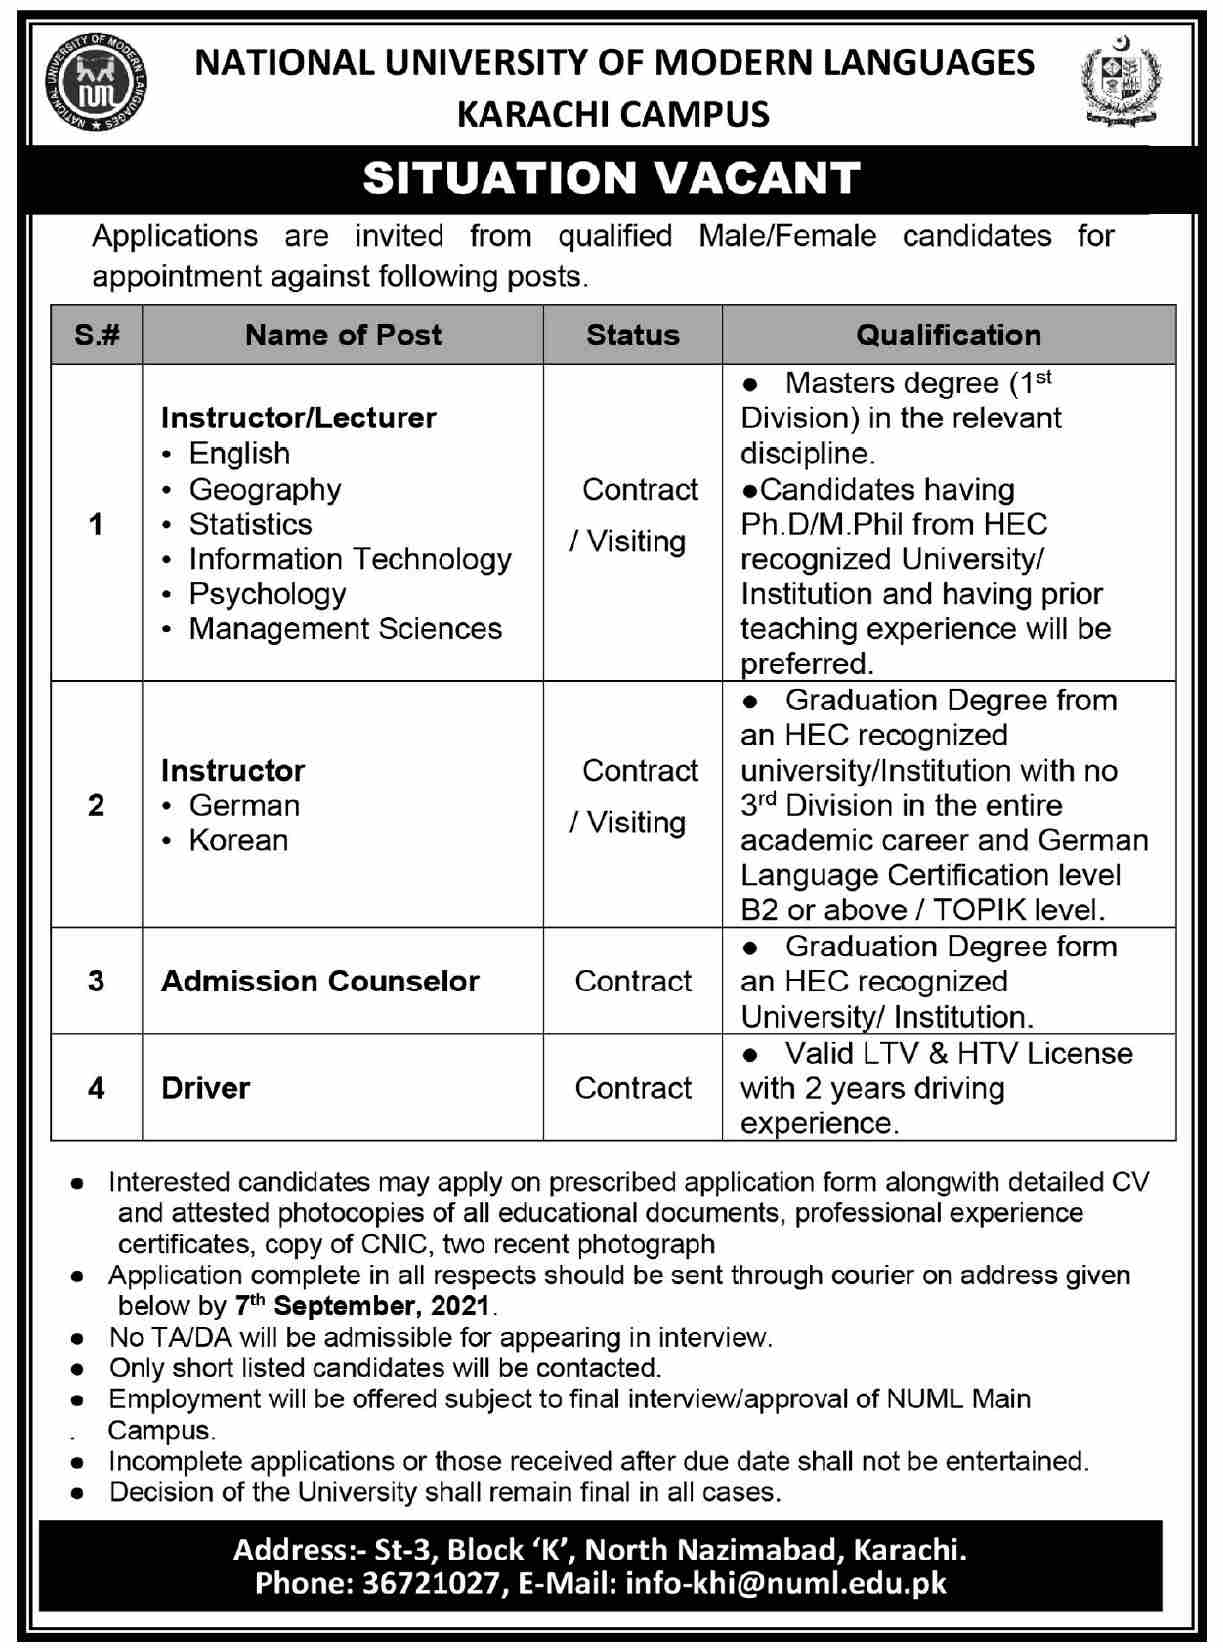 National University of Modern Languages NUML Karachi Campus Jobs 2021